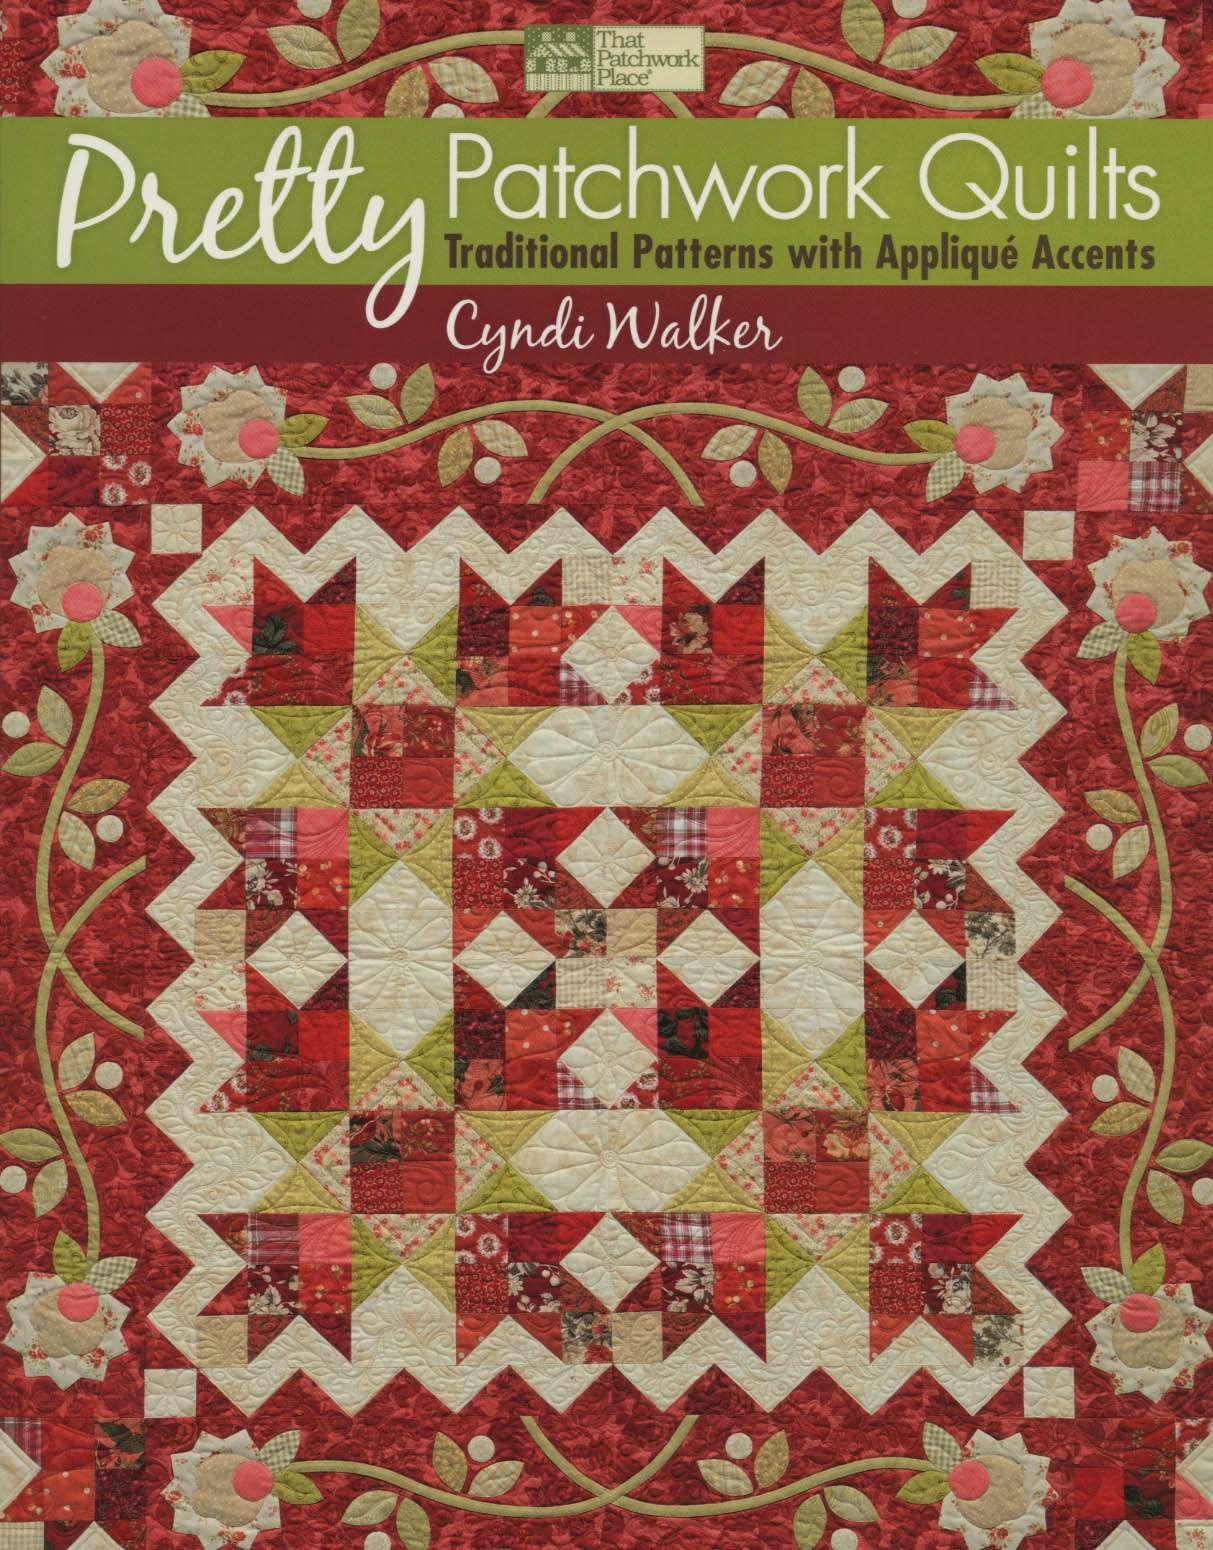 Pretty Patchwork Quilts by Cyndi Walker (Book)